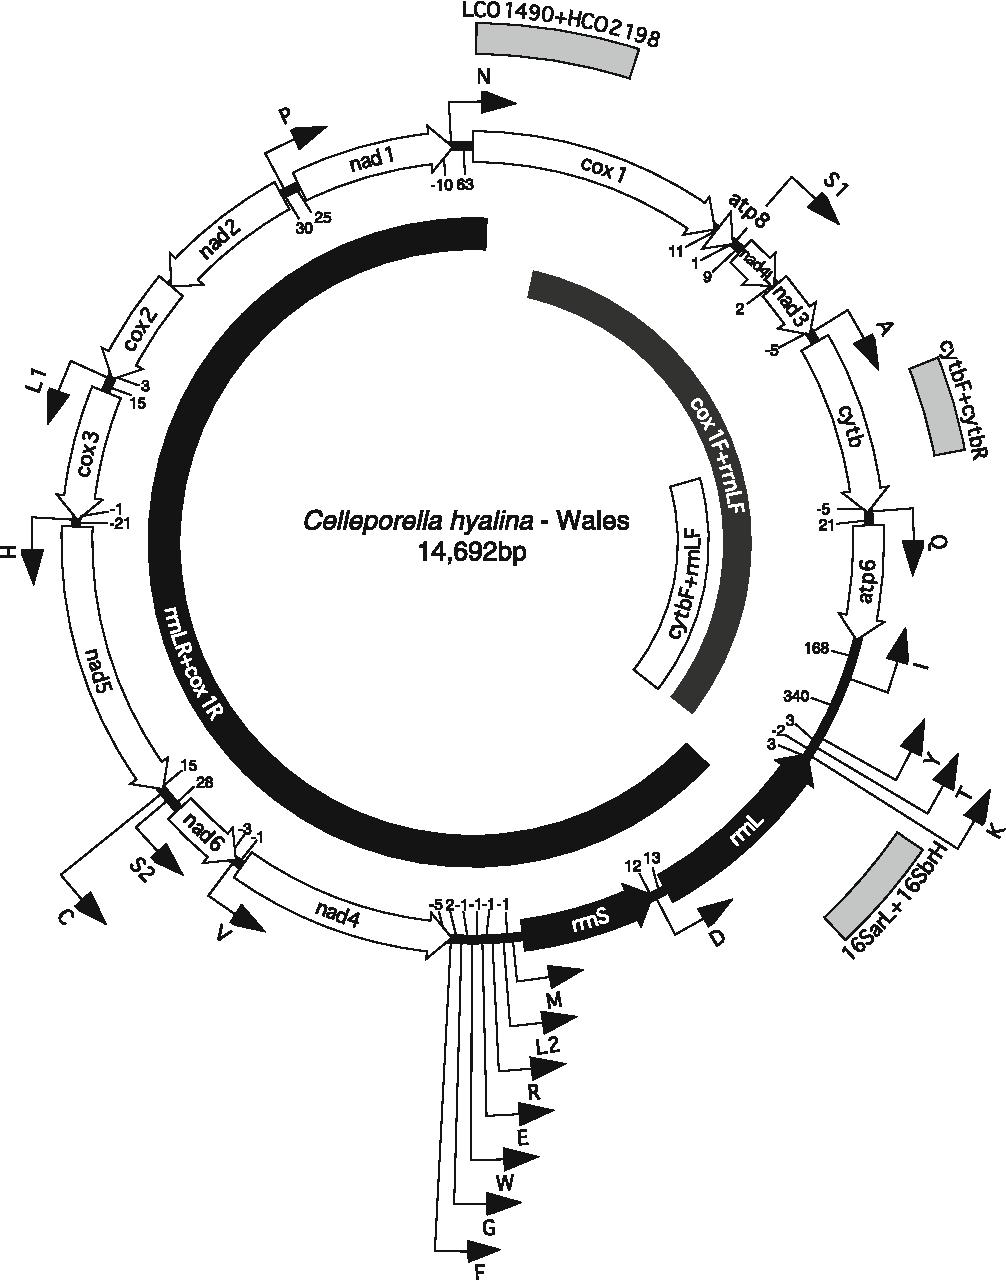 Figure 2 from Molecular variability in the Celleporella